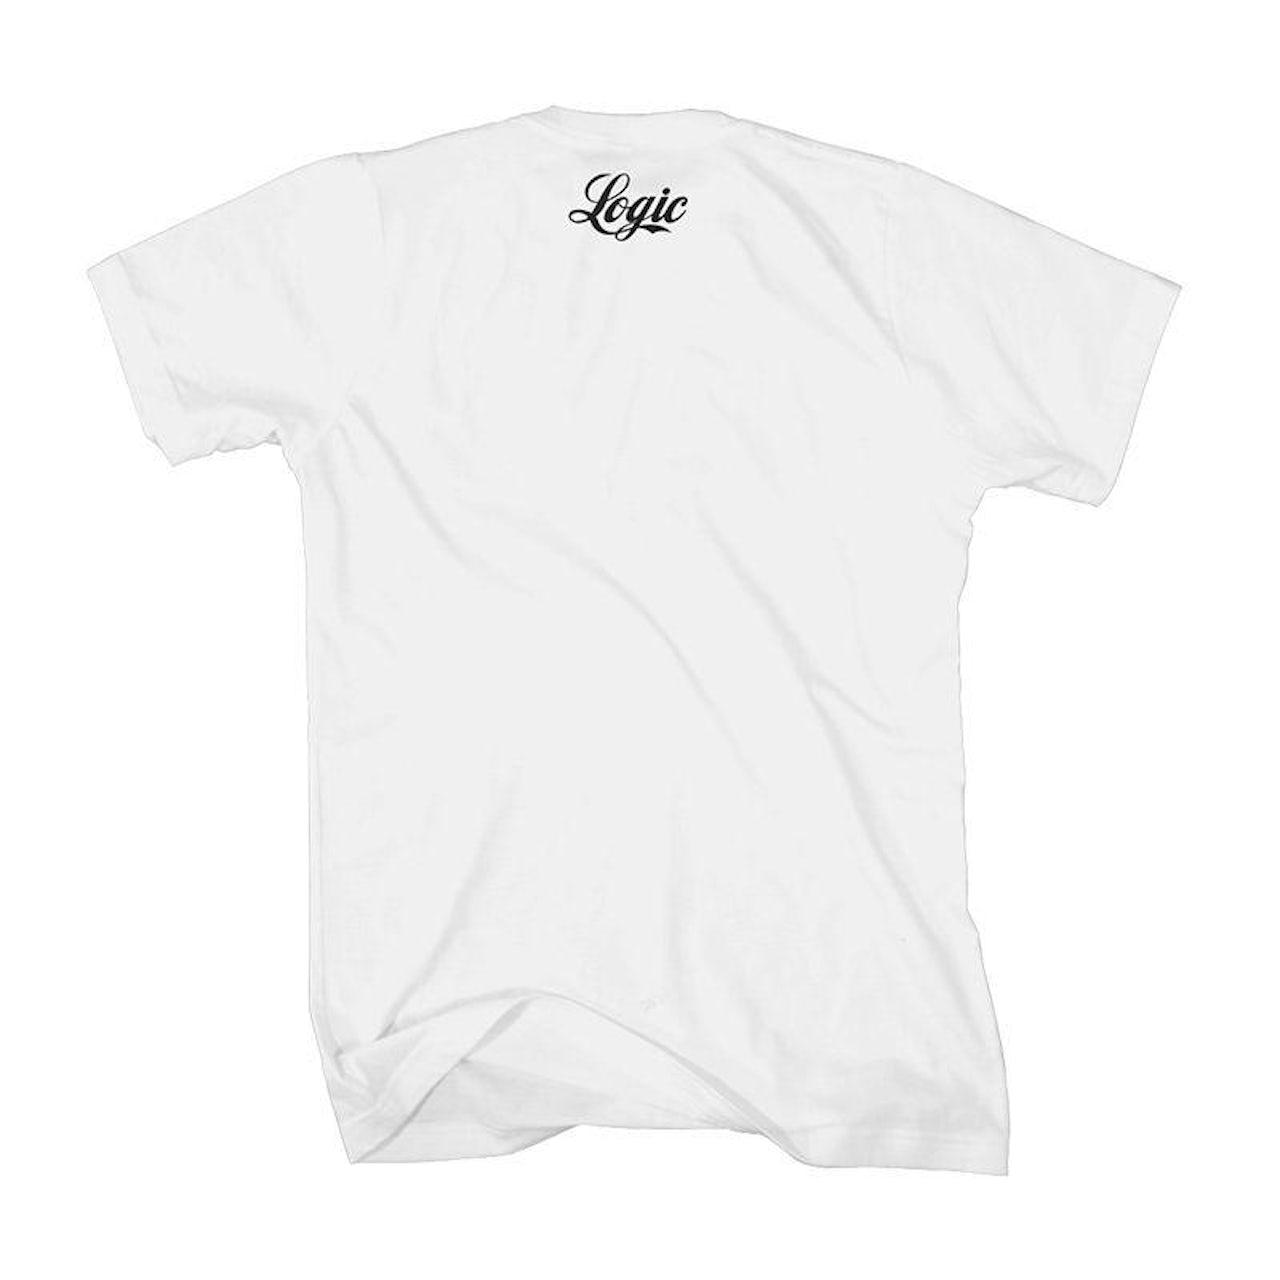 1c9c80c7f944 Logic Rattpack Zoom T-Shirt